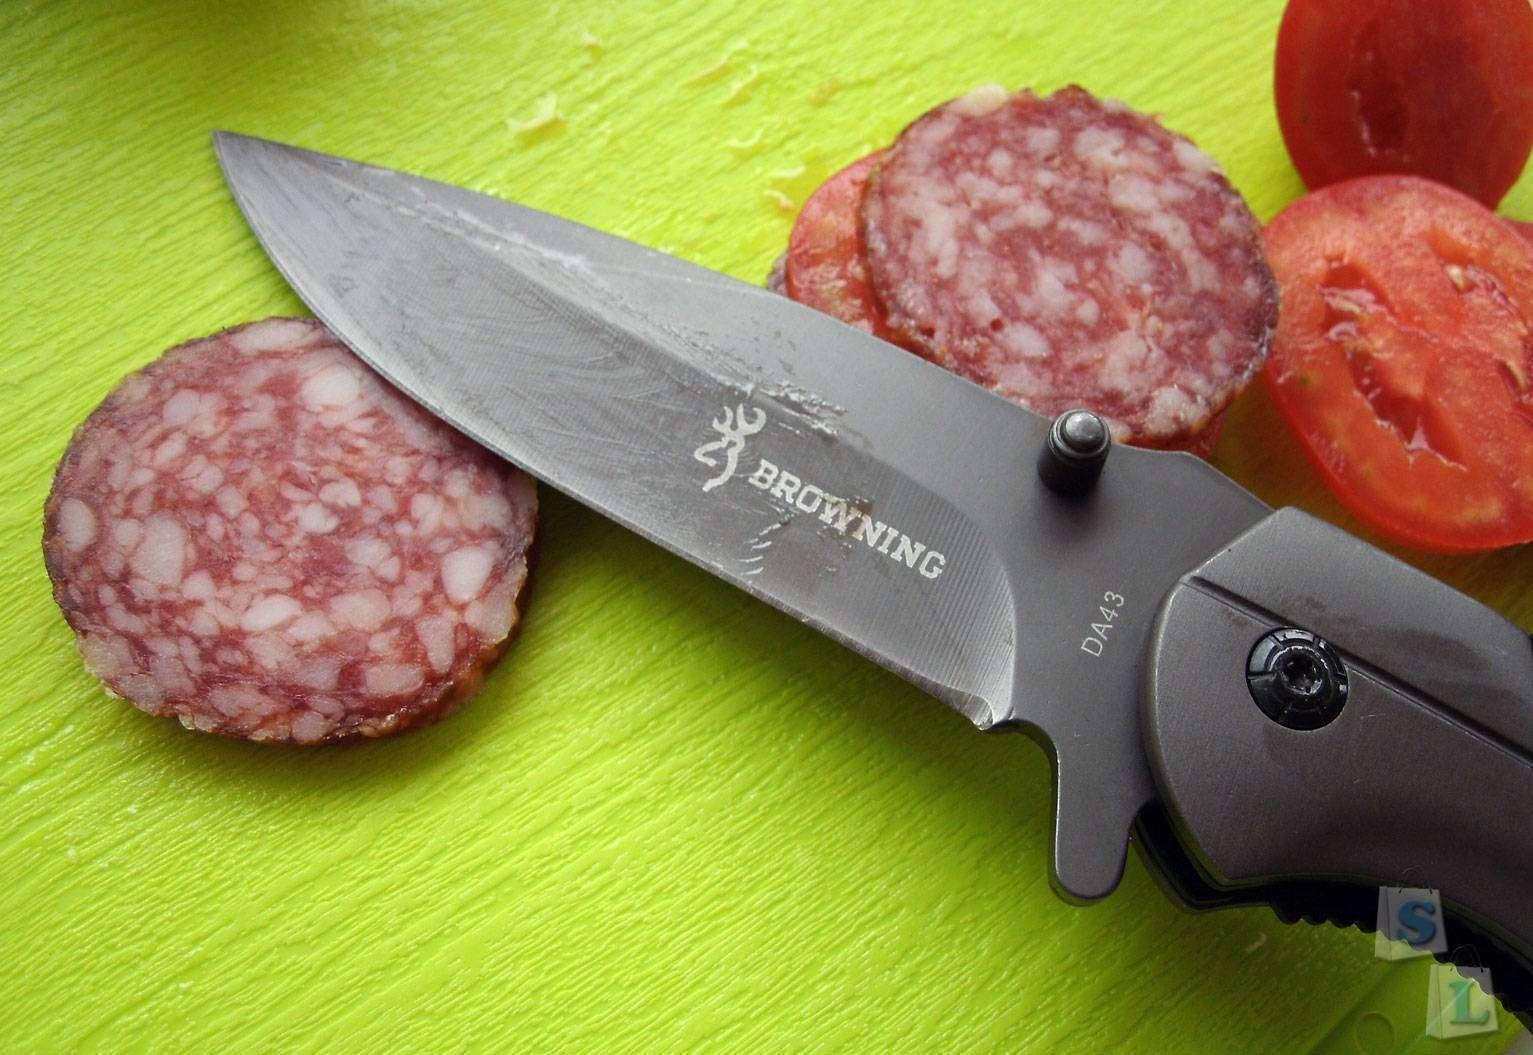 Aliexpress: Складной нож - BROWNING DA43